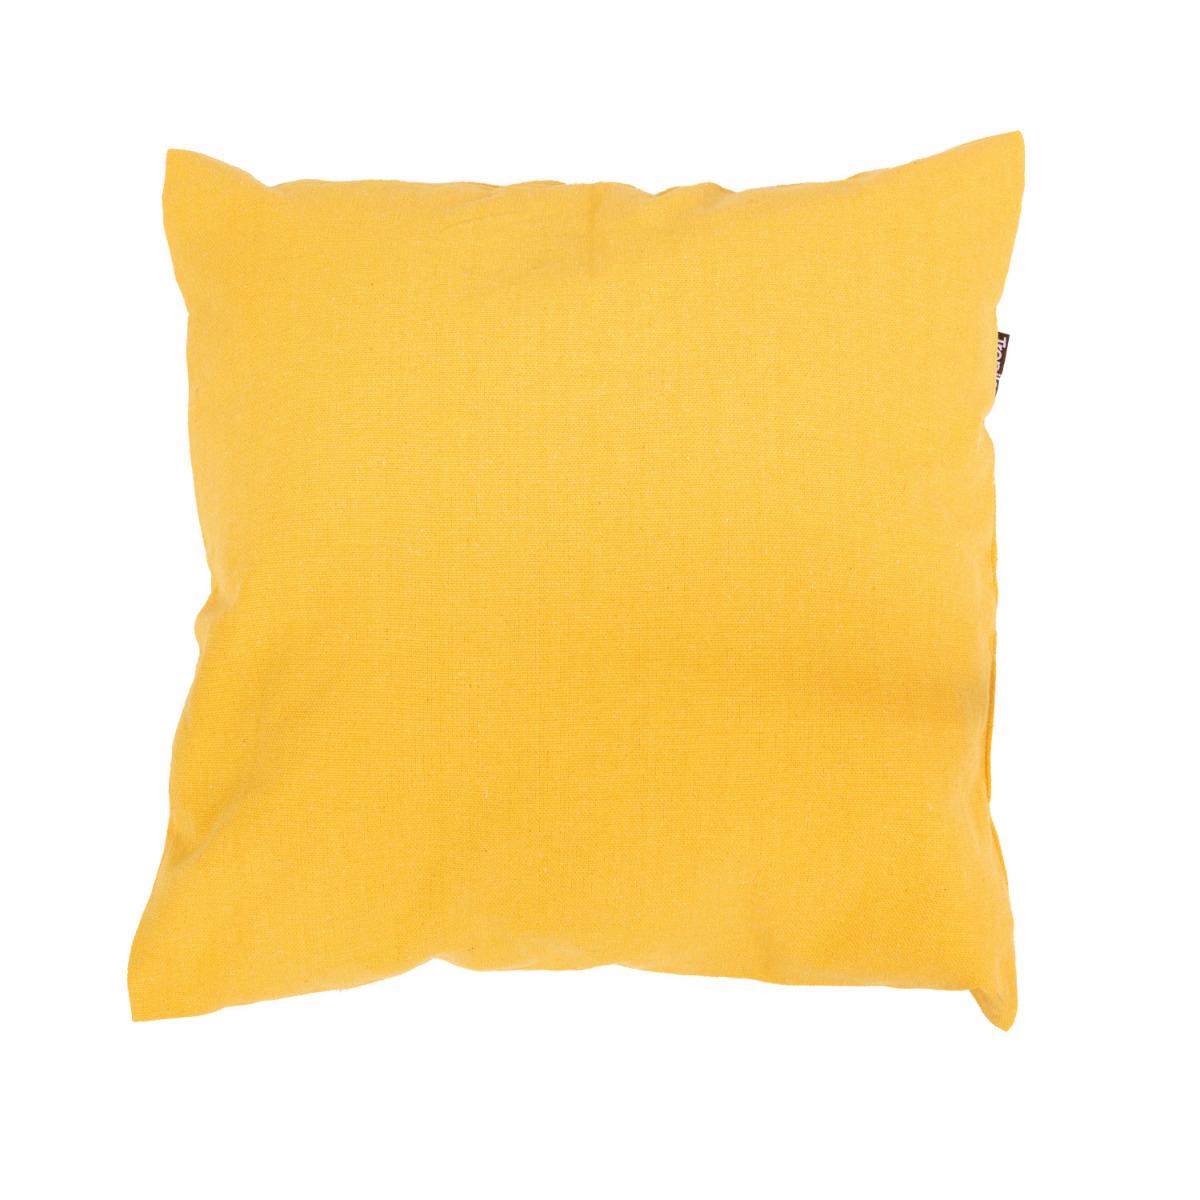 'Plain' Yellow Kussentje - Geel - Tropilex �